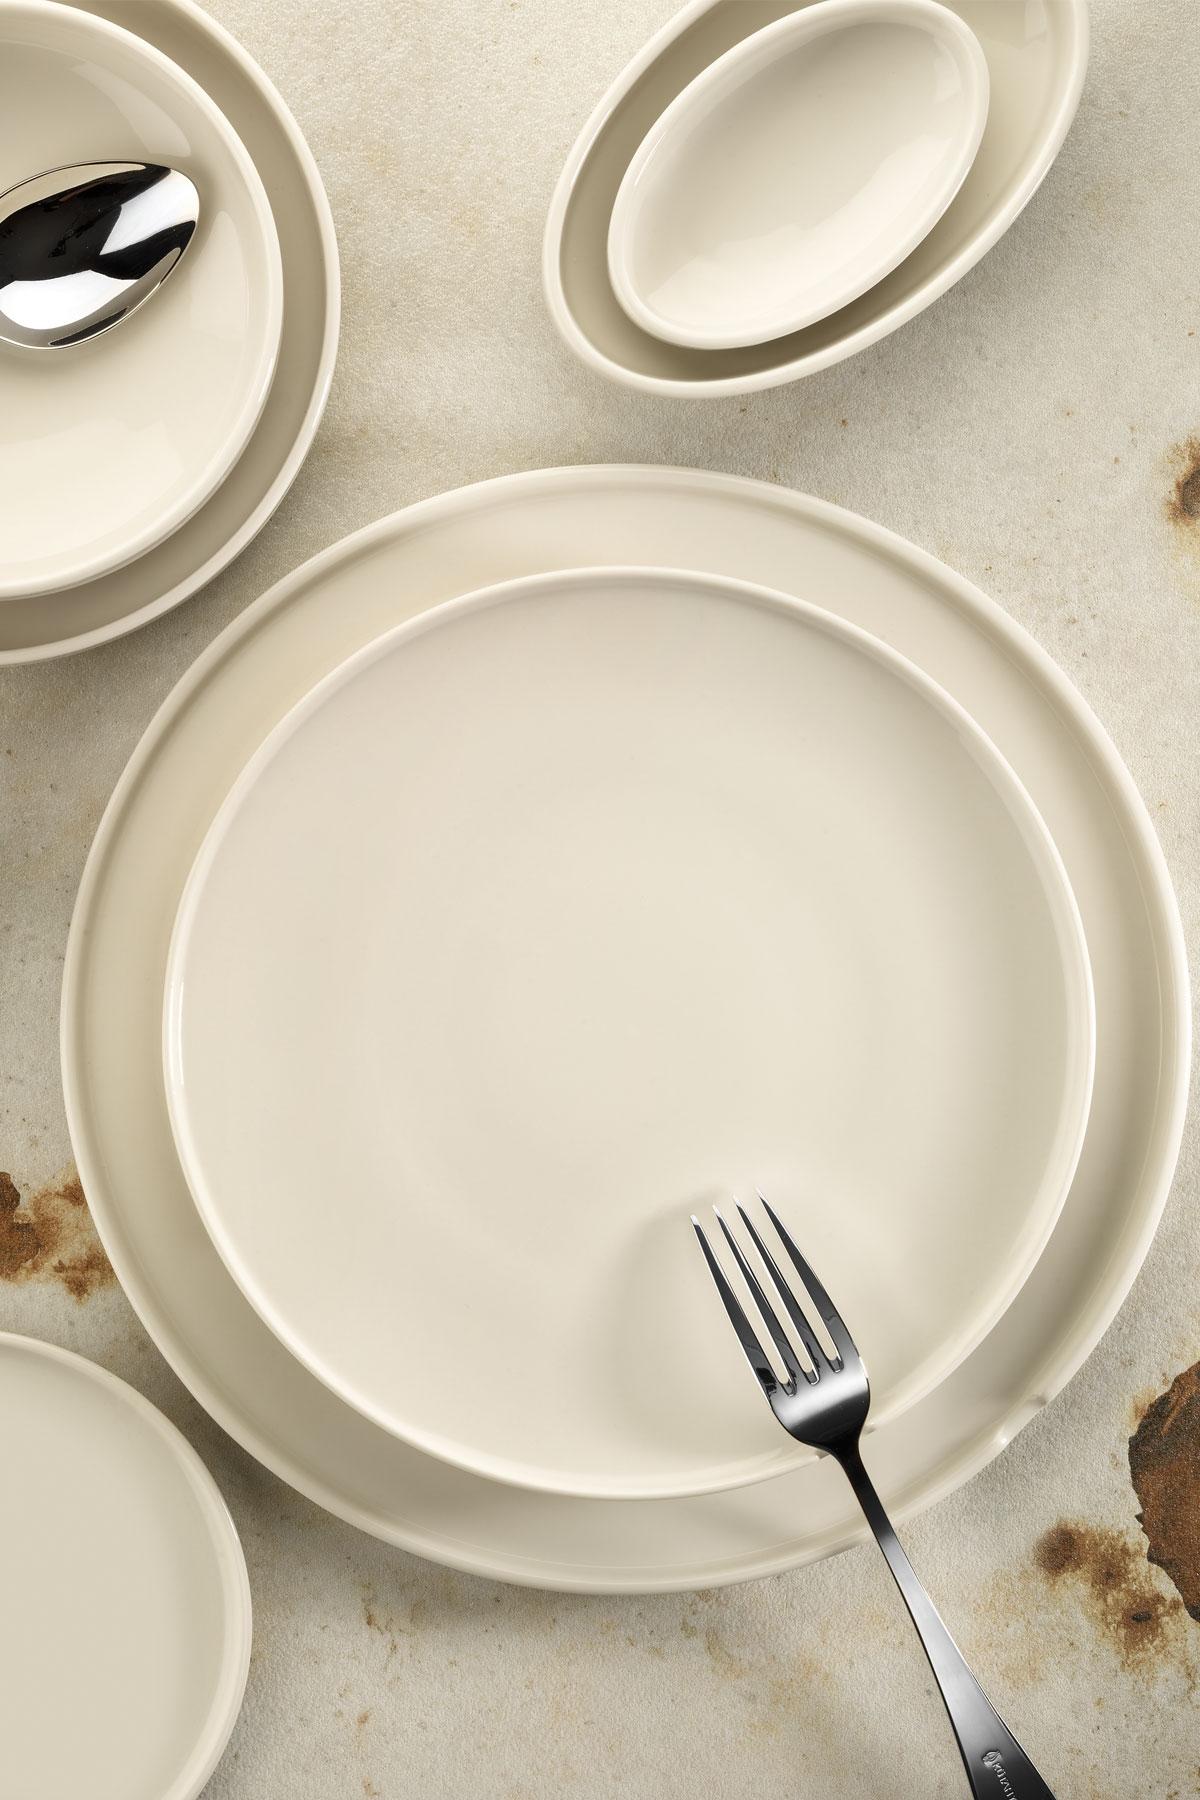 Kütahya Porselen Chef Taste Of 17 cm Oval Kase Krem